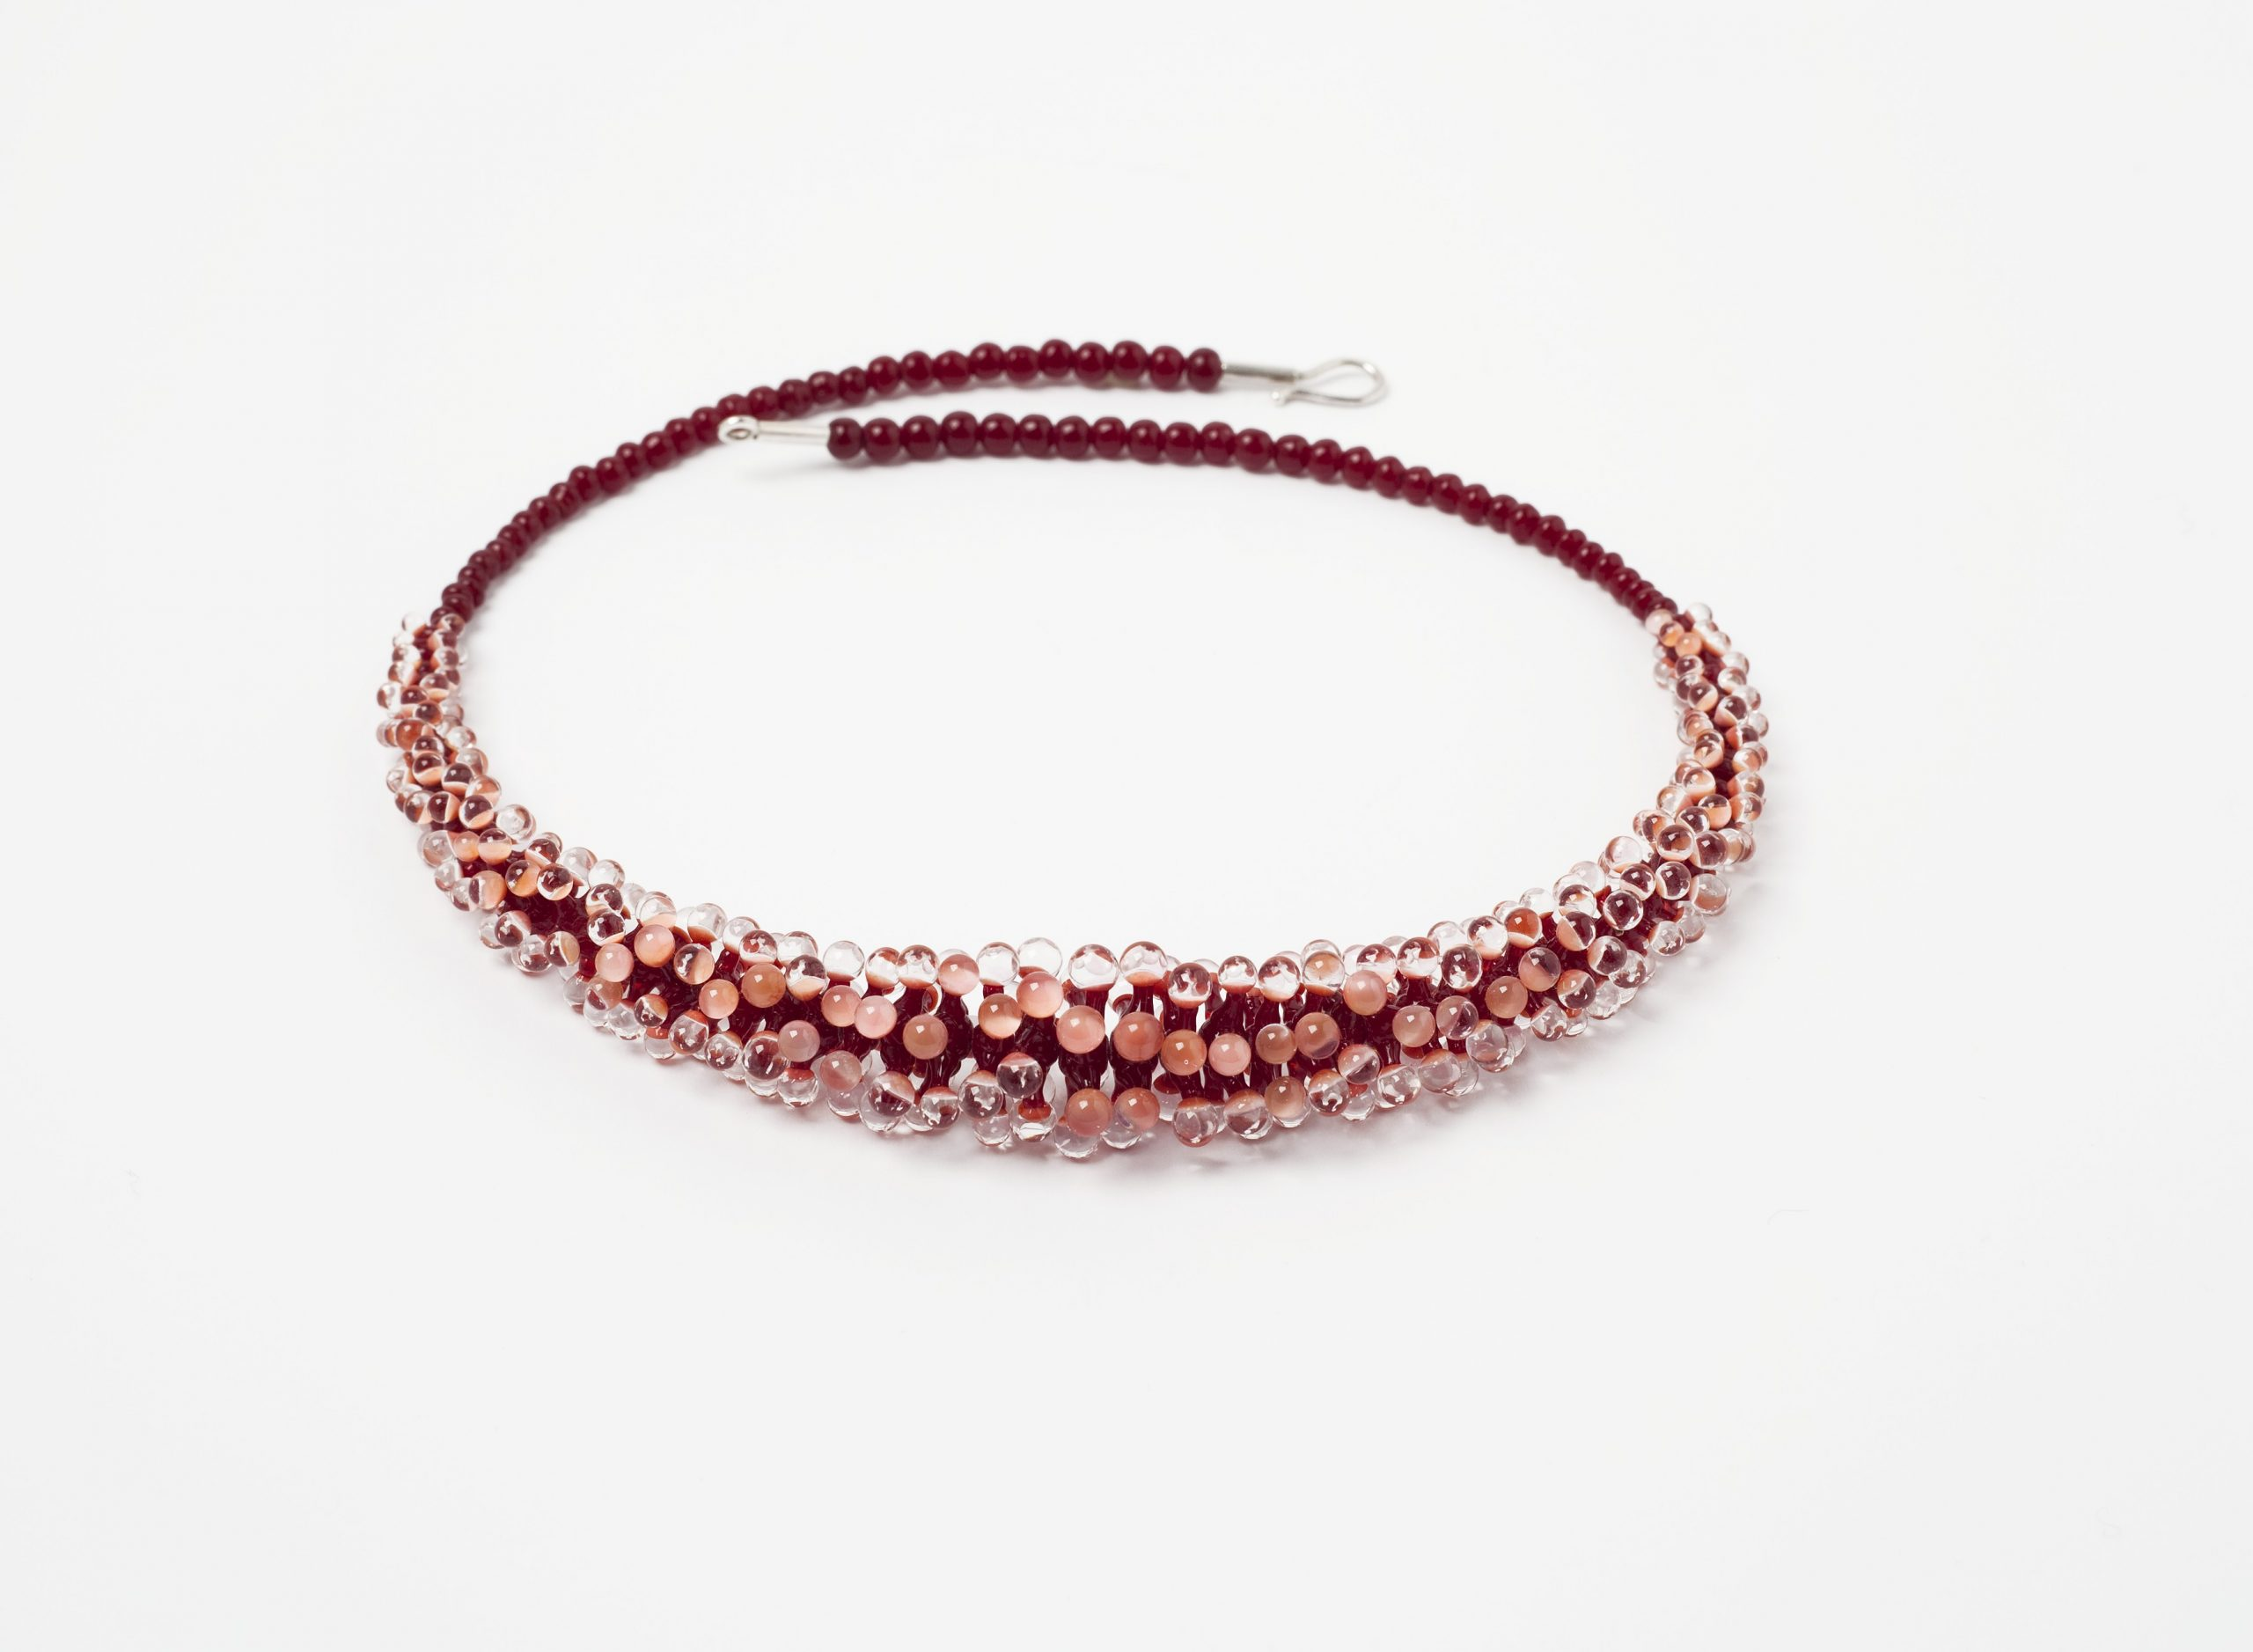 Seeanemone rot- lachs 3 farbig | Glas Stahlseil, Silber | 160991-19